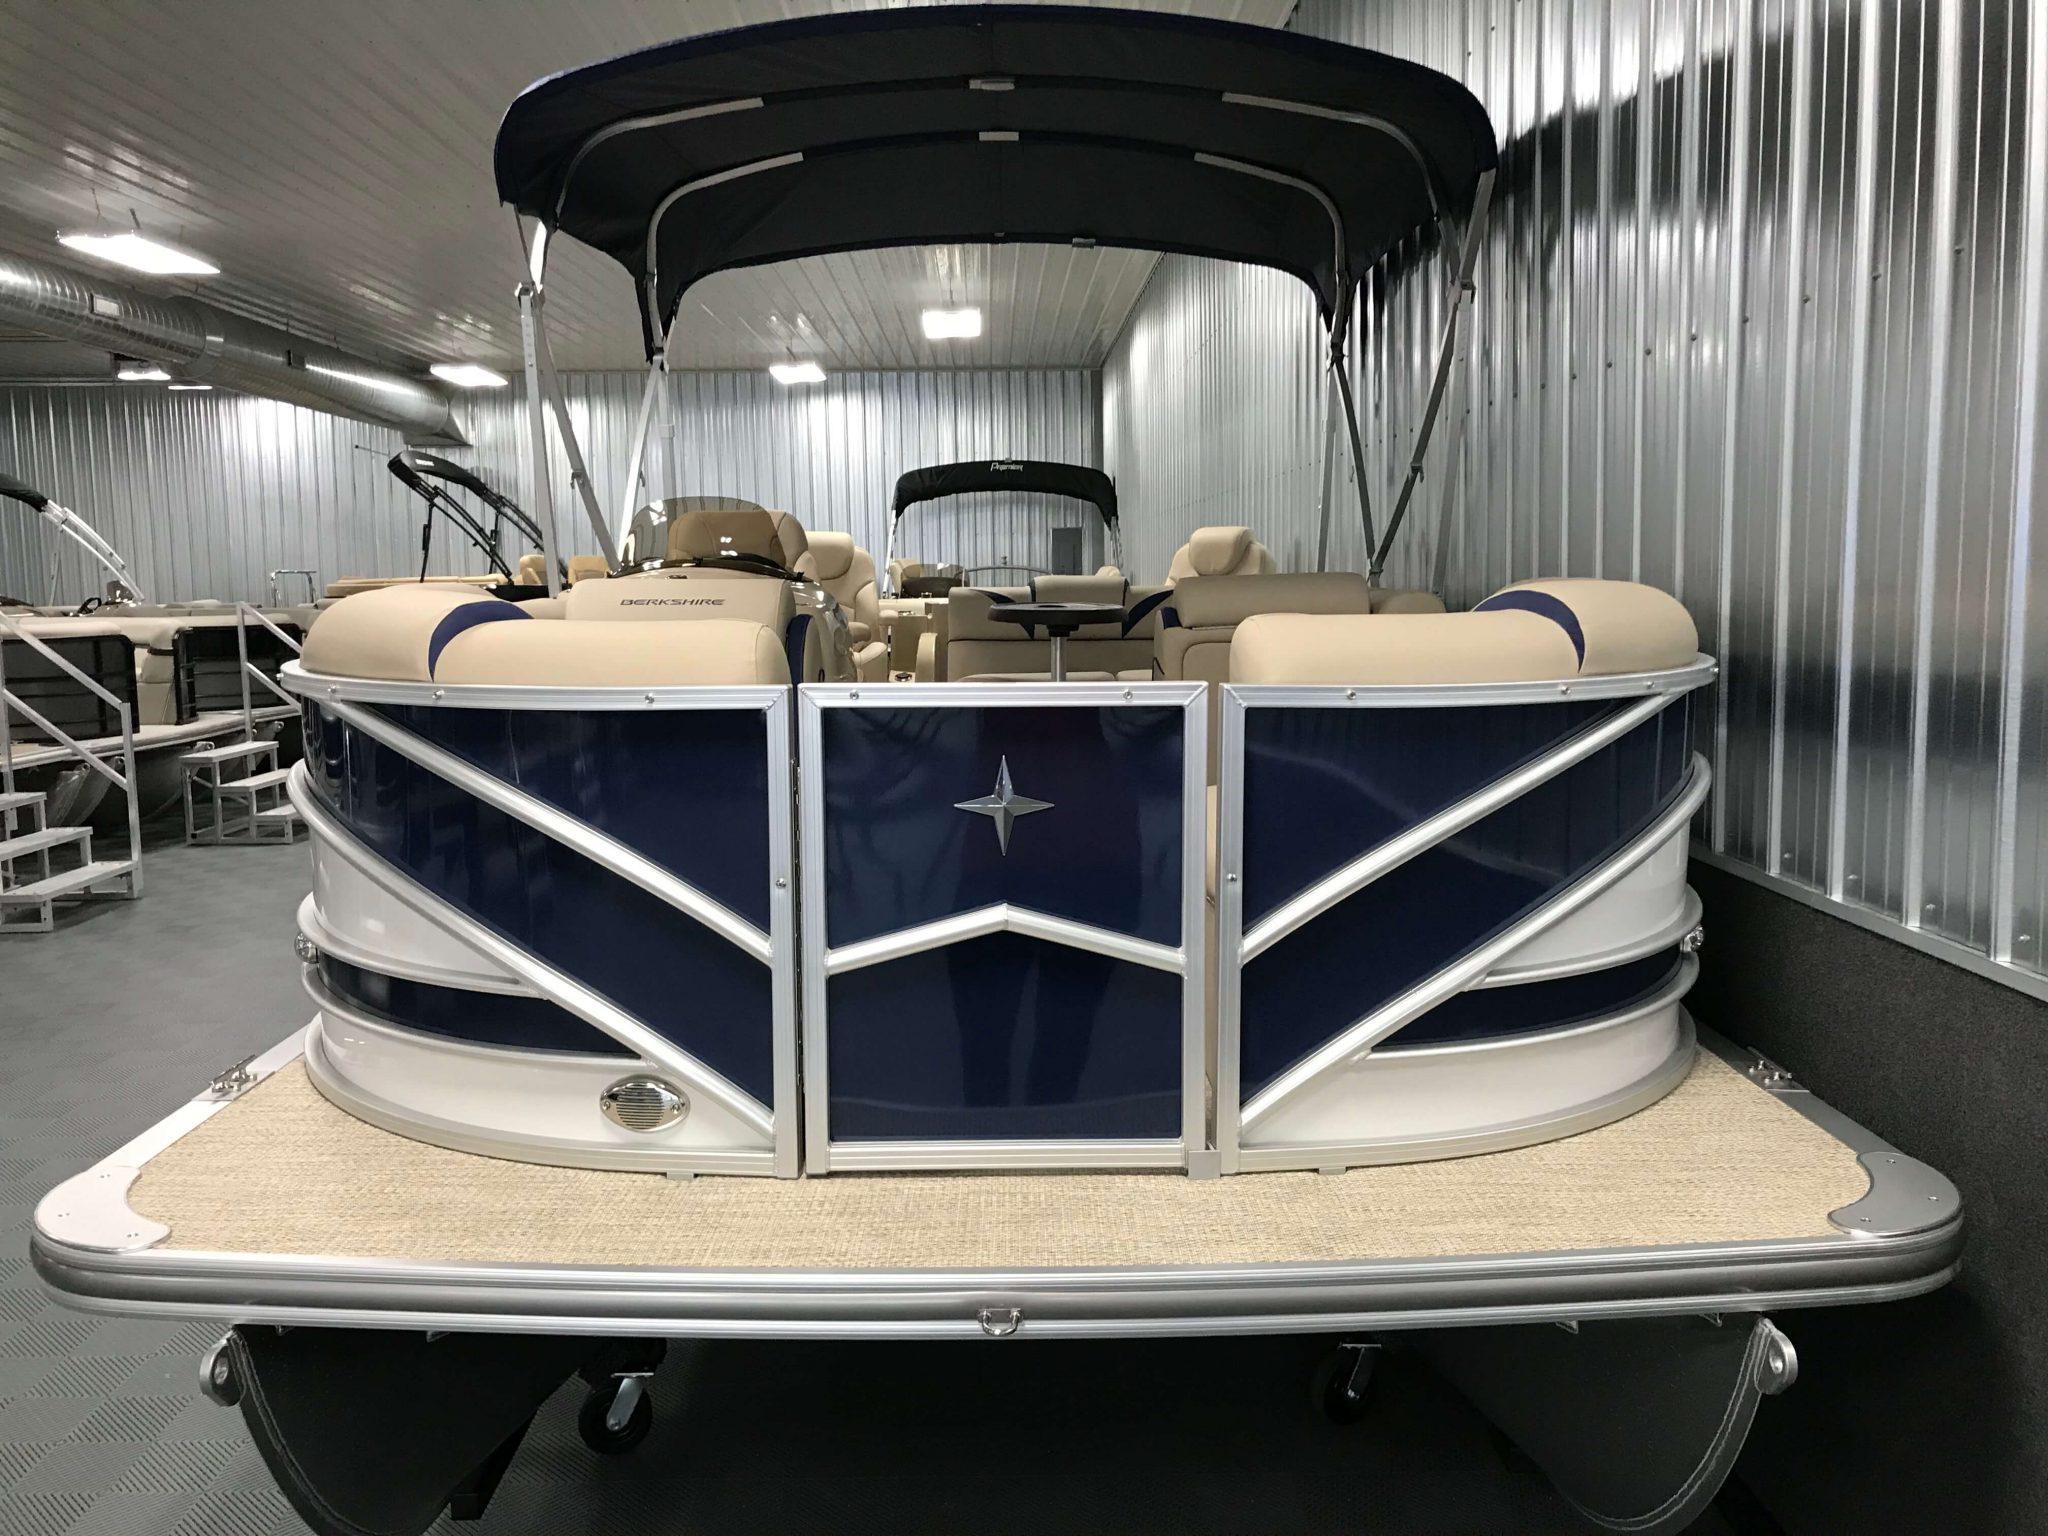 2019 Berkshire 23RFC2 STS Deluxe Pontoon Blue Bimini Top 2